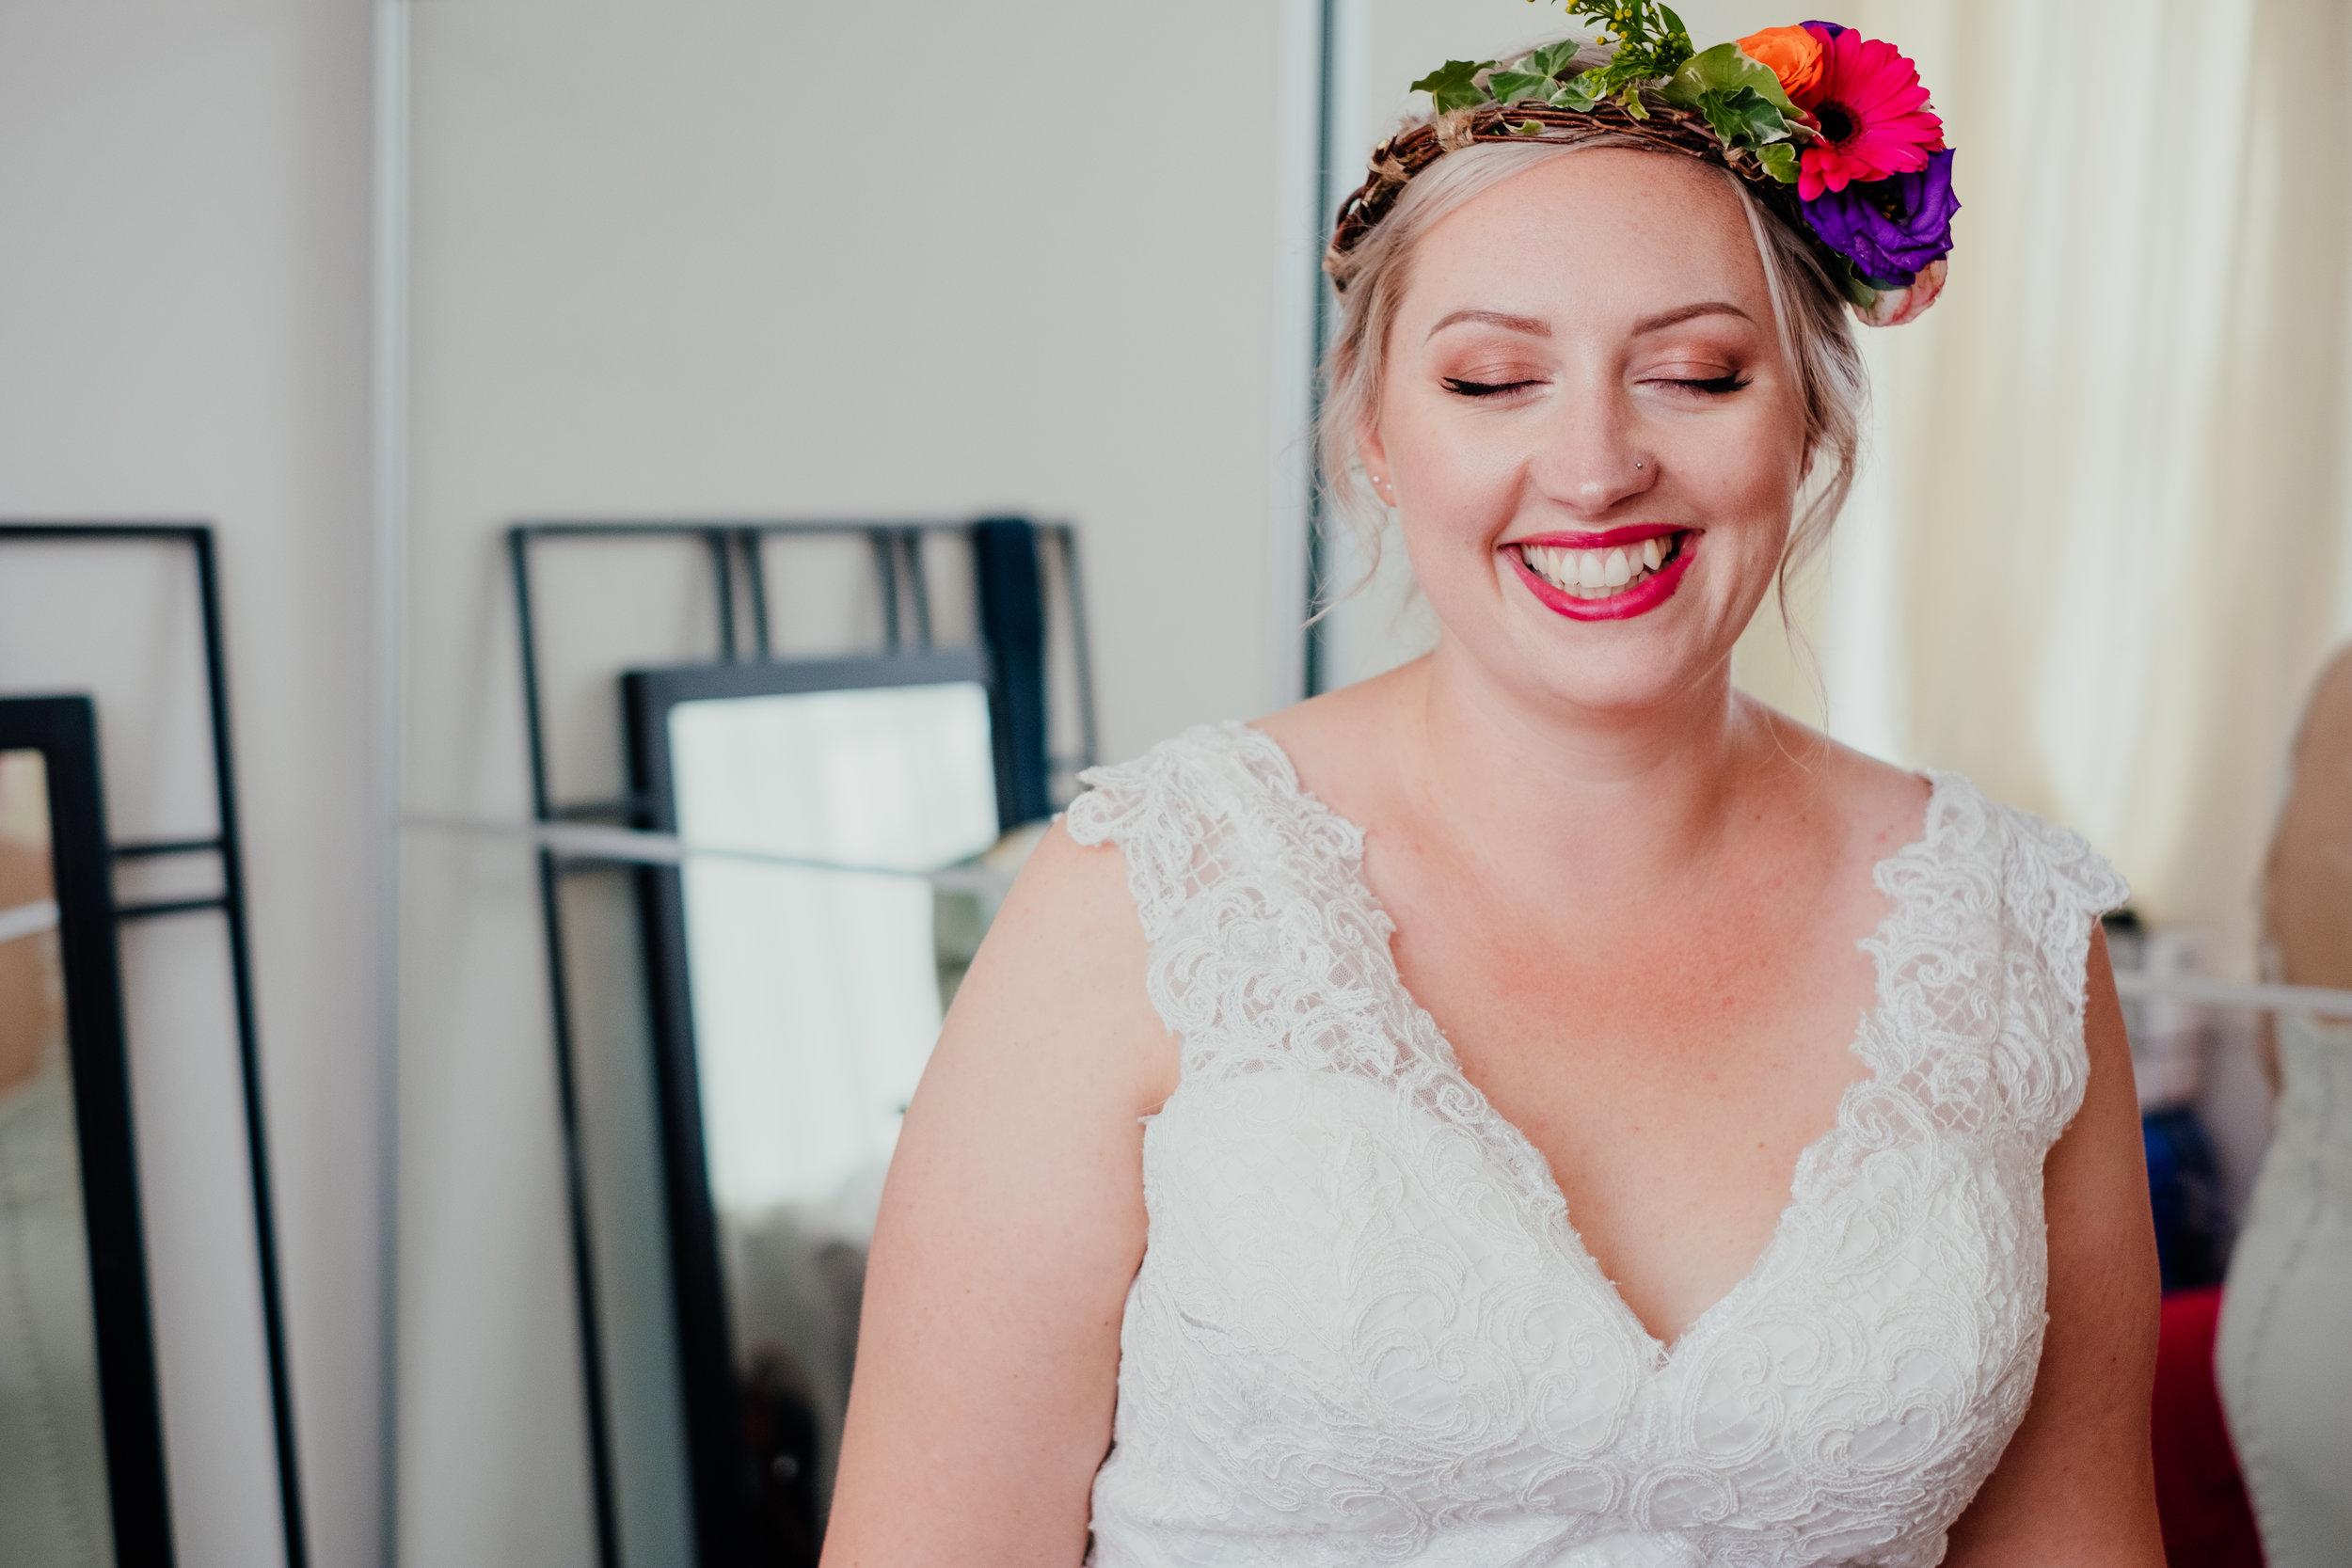 Vegan bride wearing flower crown smiling